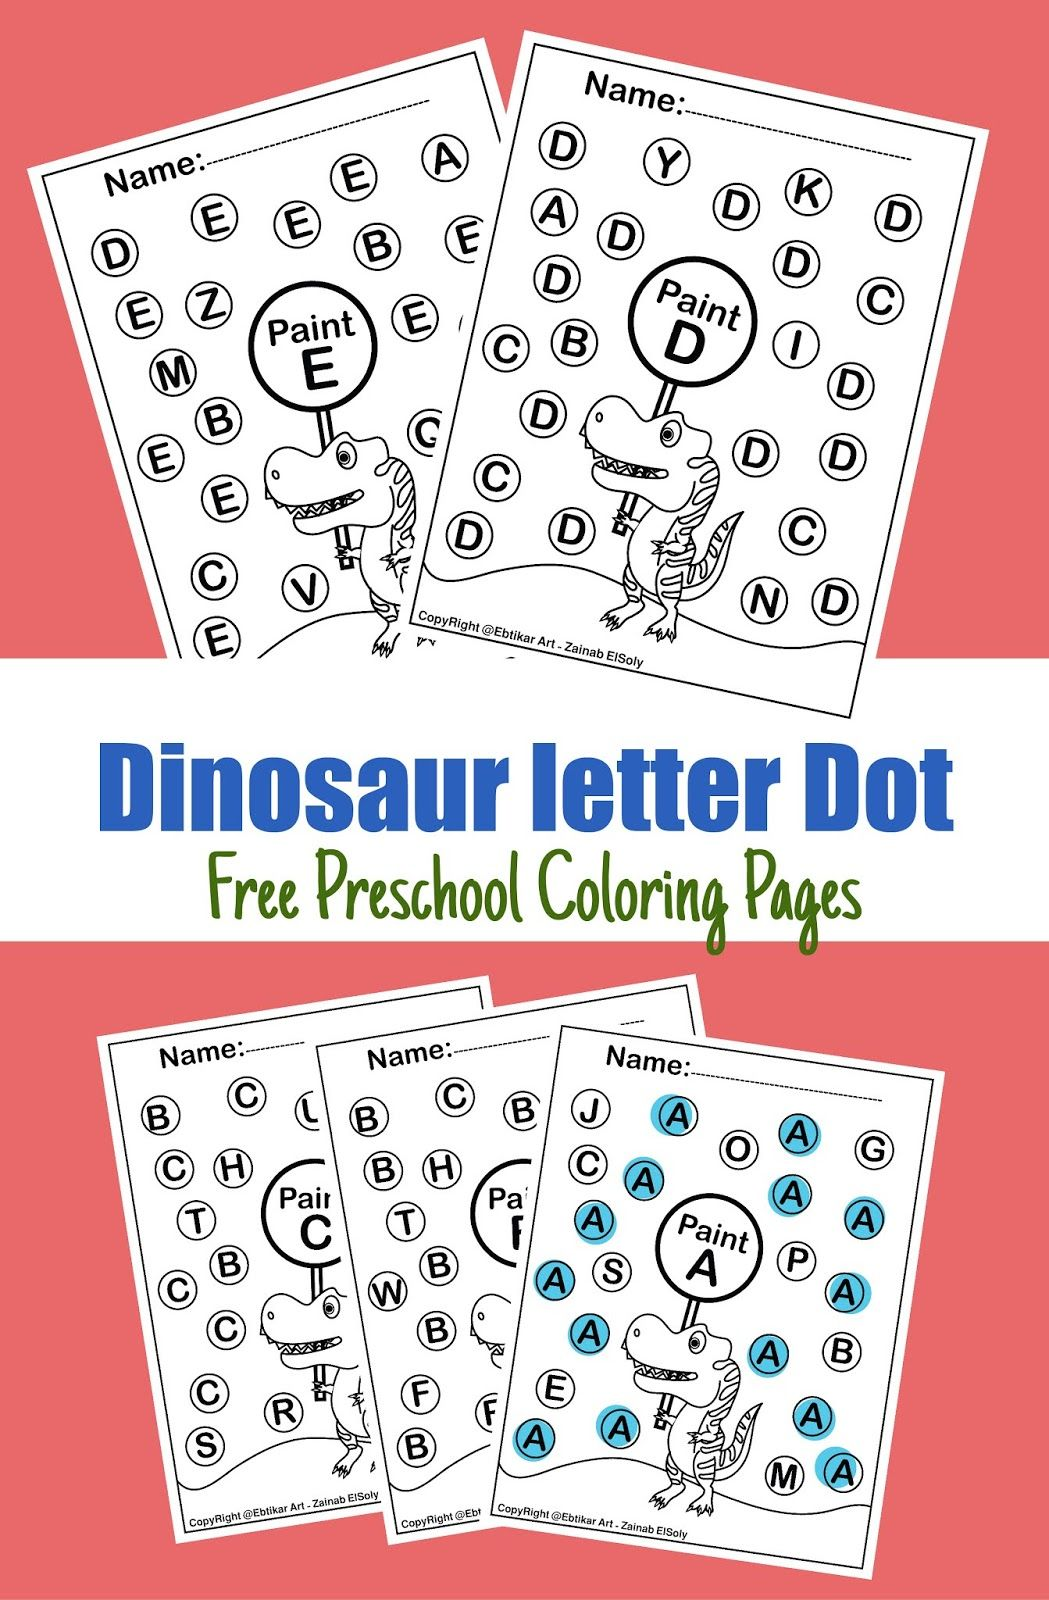 Abc Dinosaur Trex Activity Paint A Dot Preschool Coloring